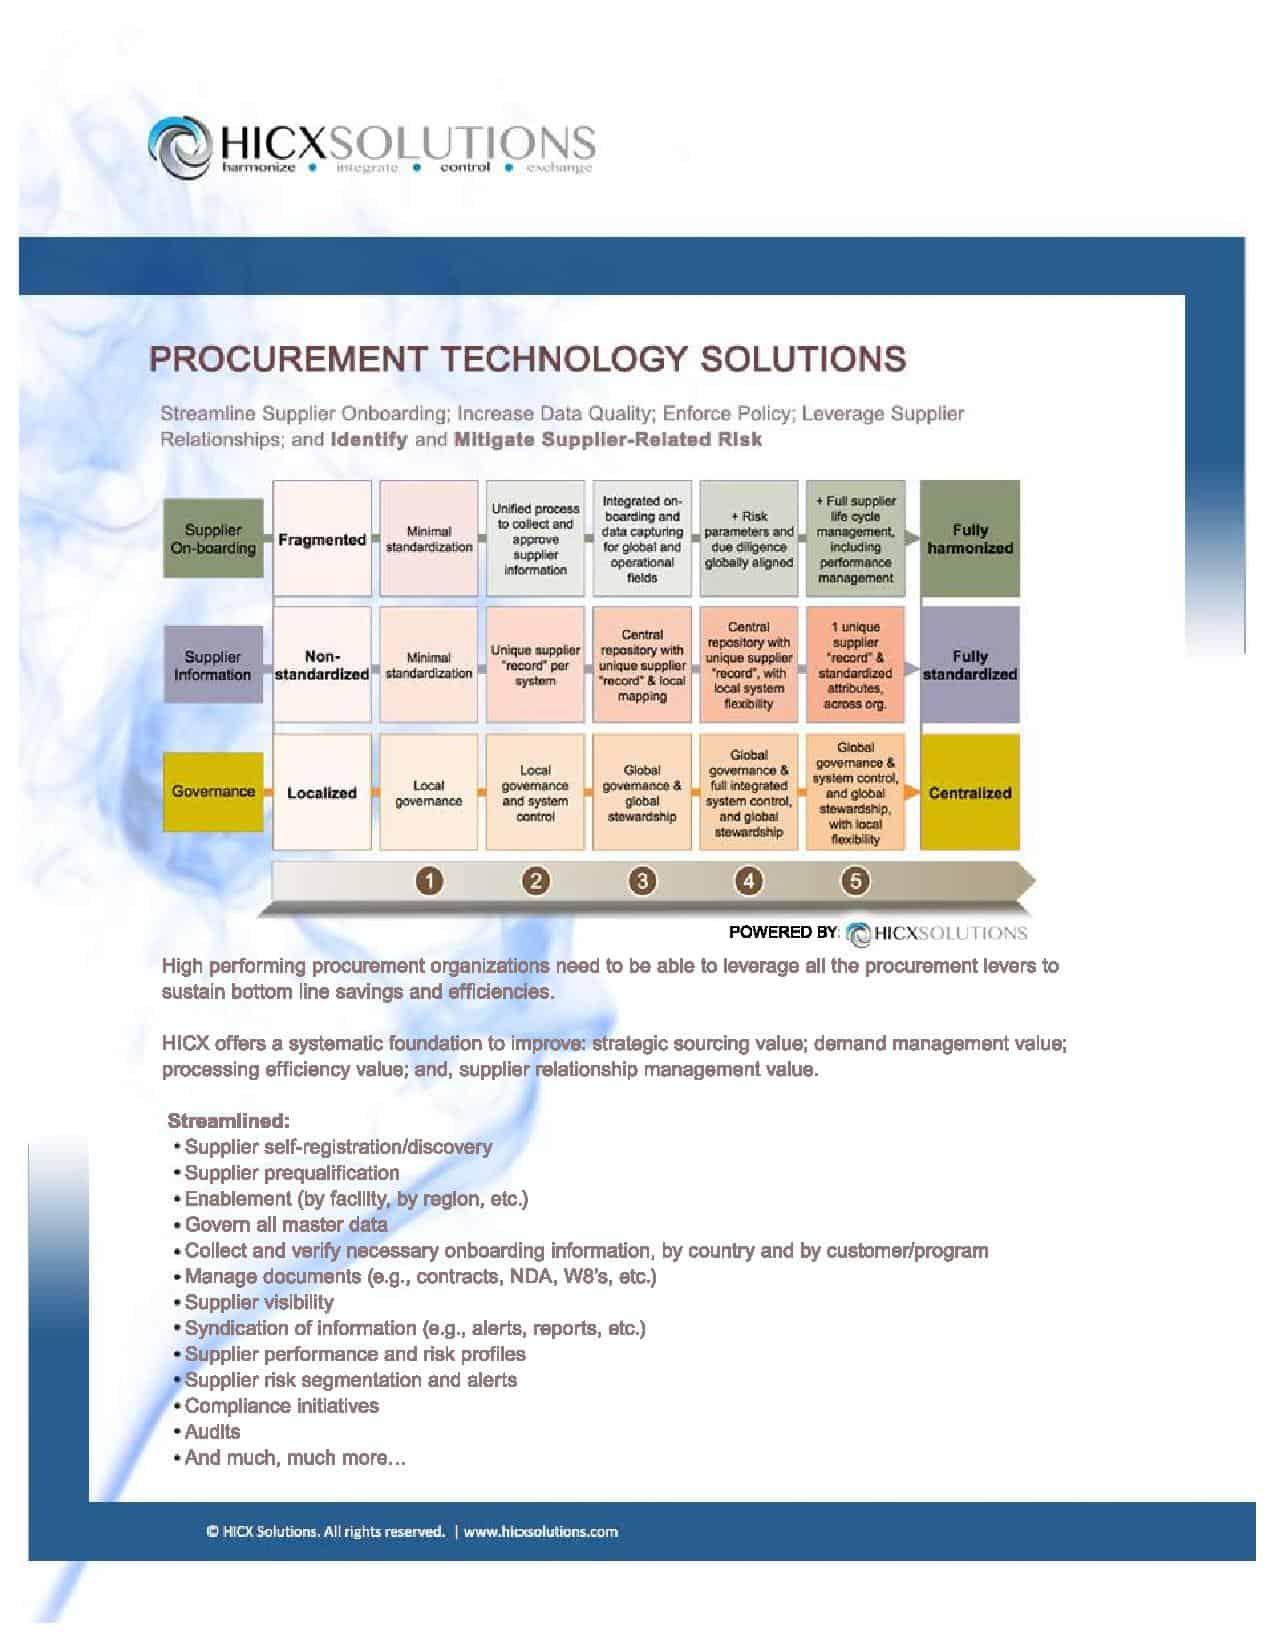 Procurement Technology Solutions Infographic 2